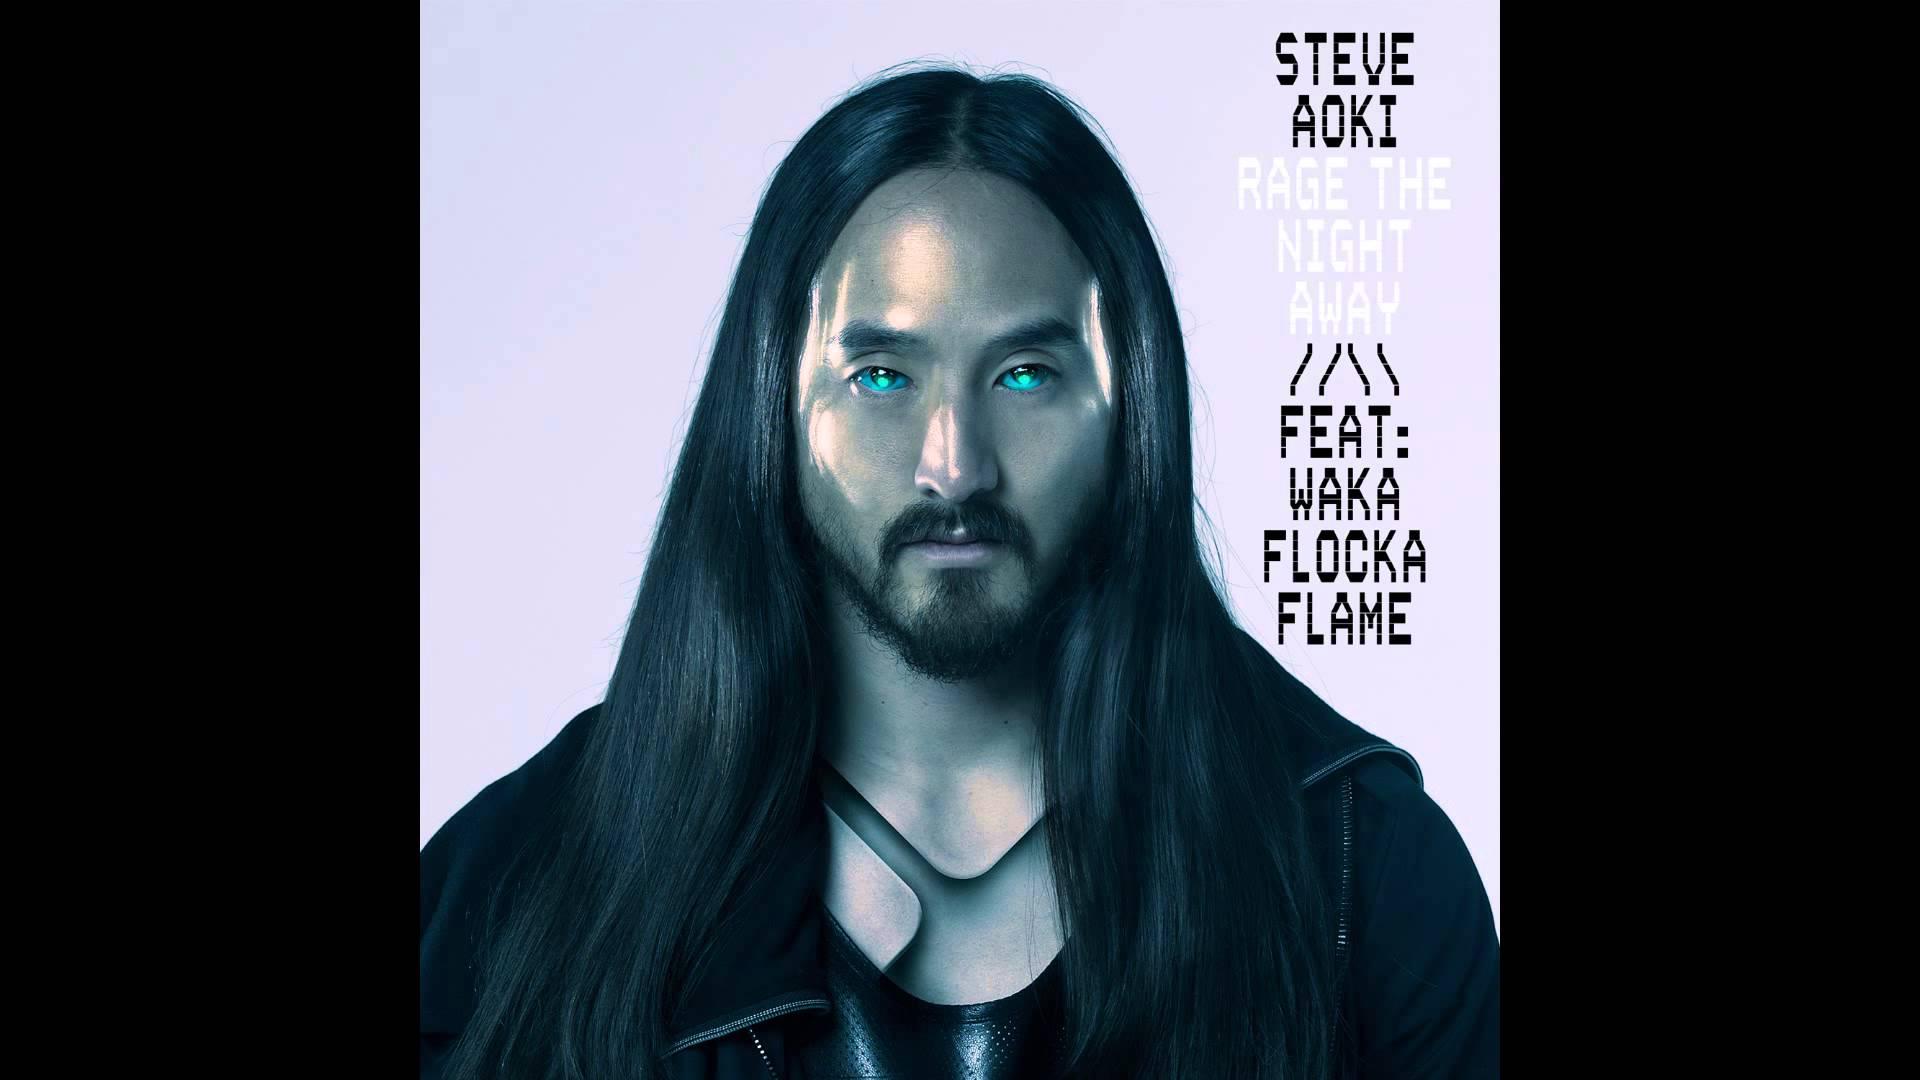 Steven Aoki